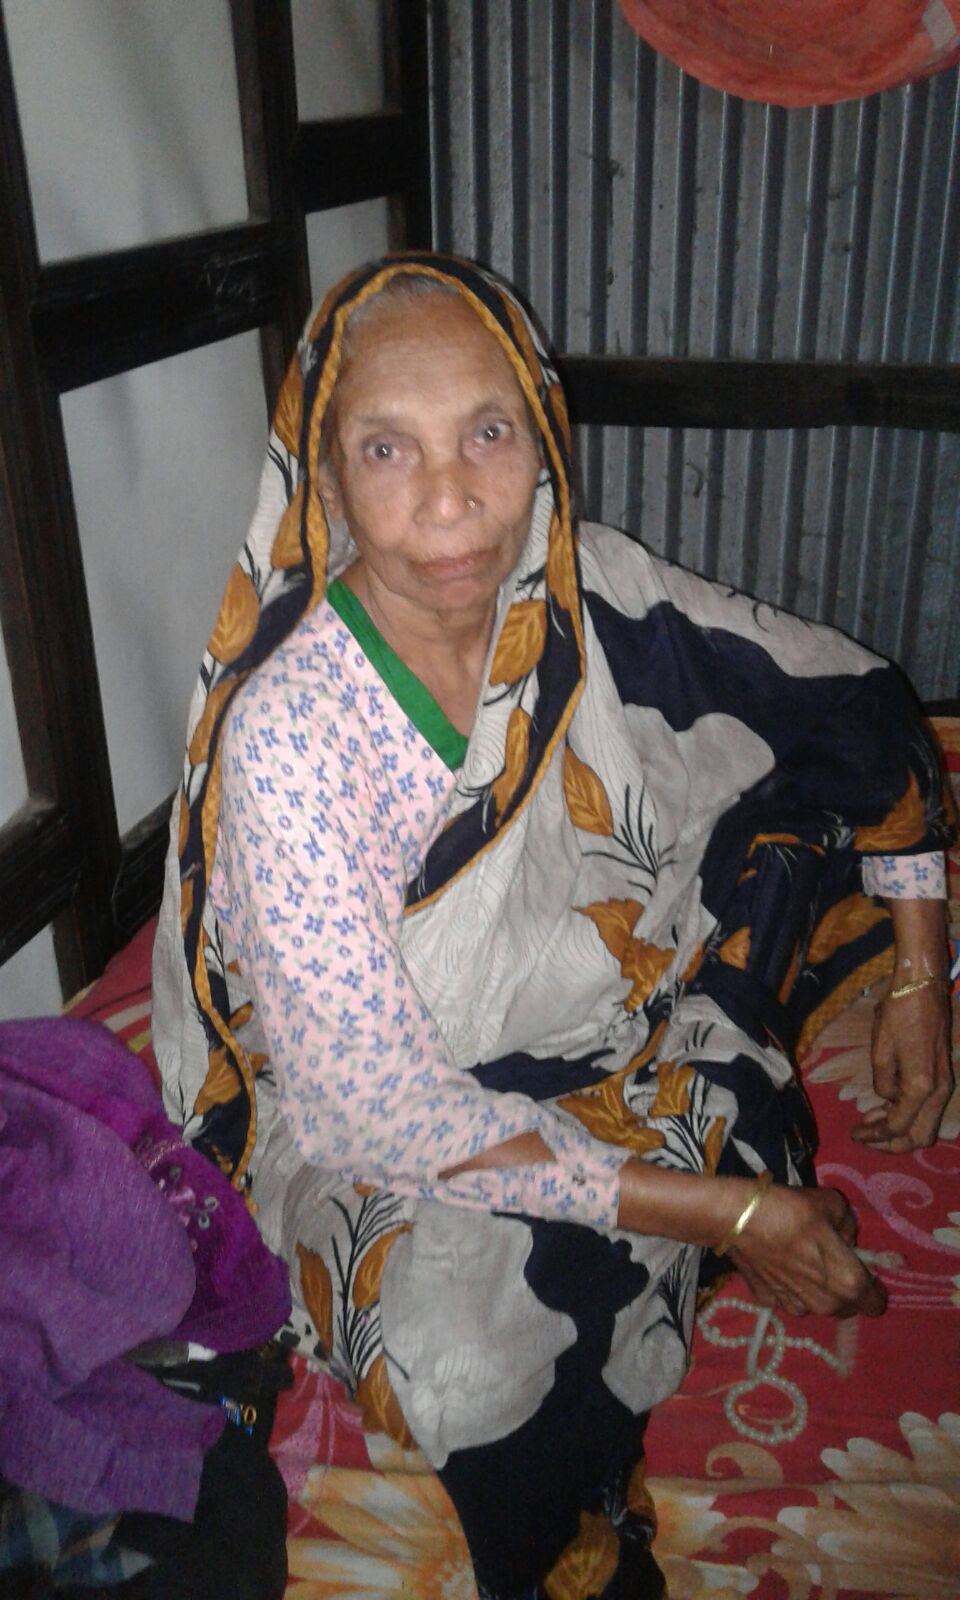 aysa-grand-mere-maternelle-rubel-12-janvier-2016-bientot-mon-third-travel-chez-mes-amis-au-bangladesh